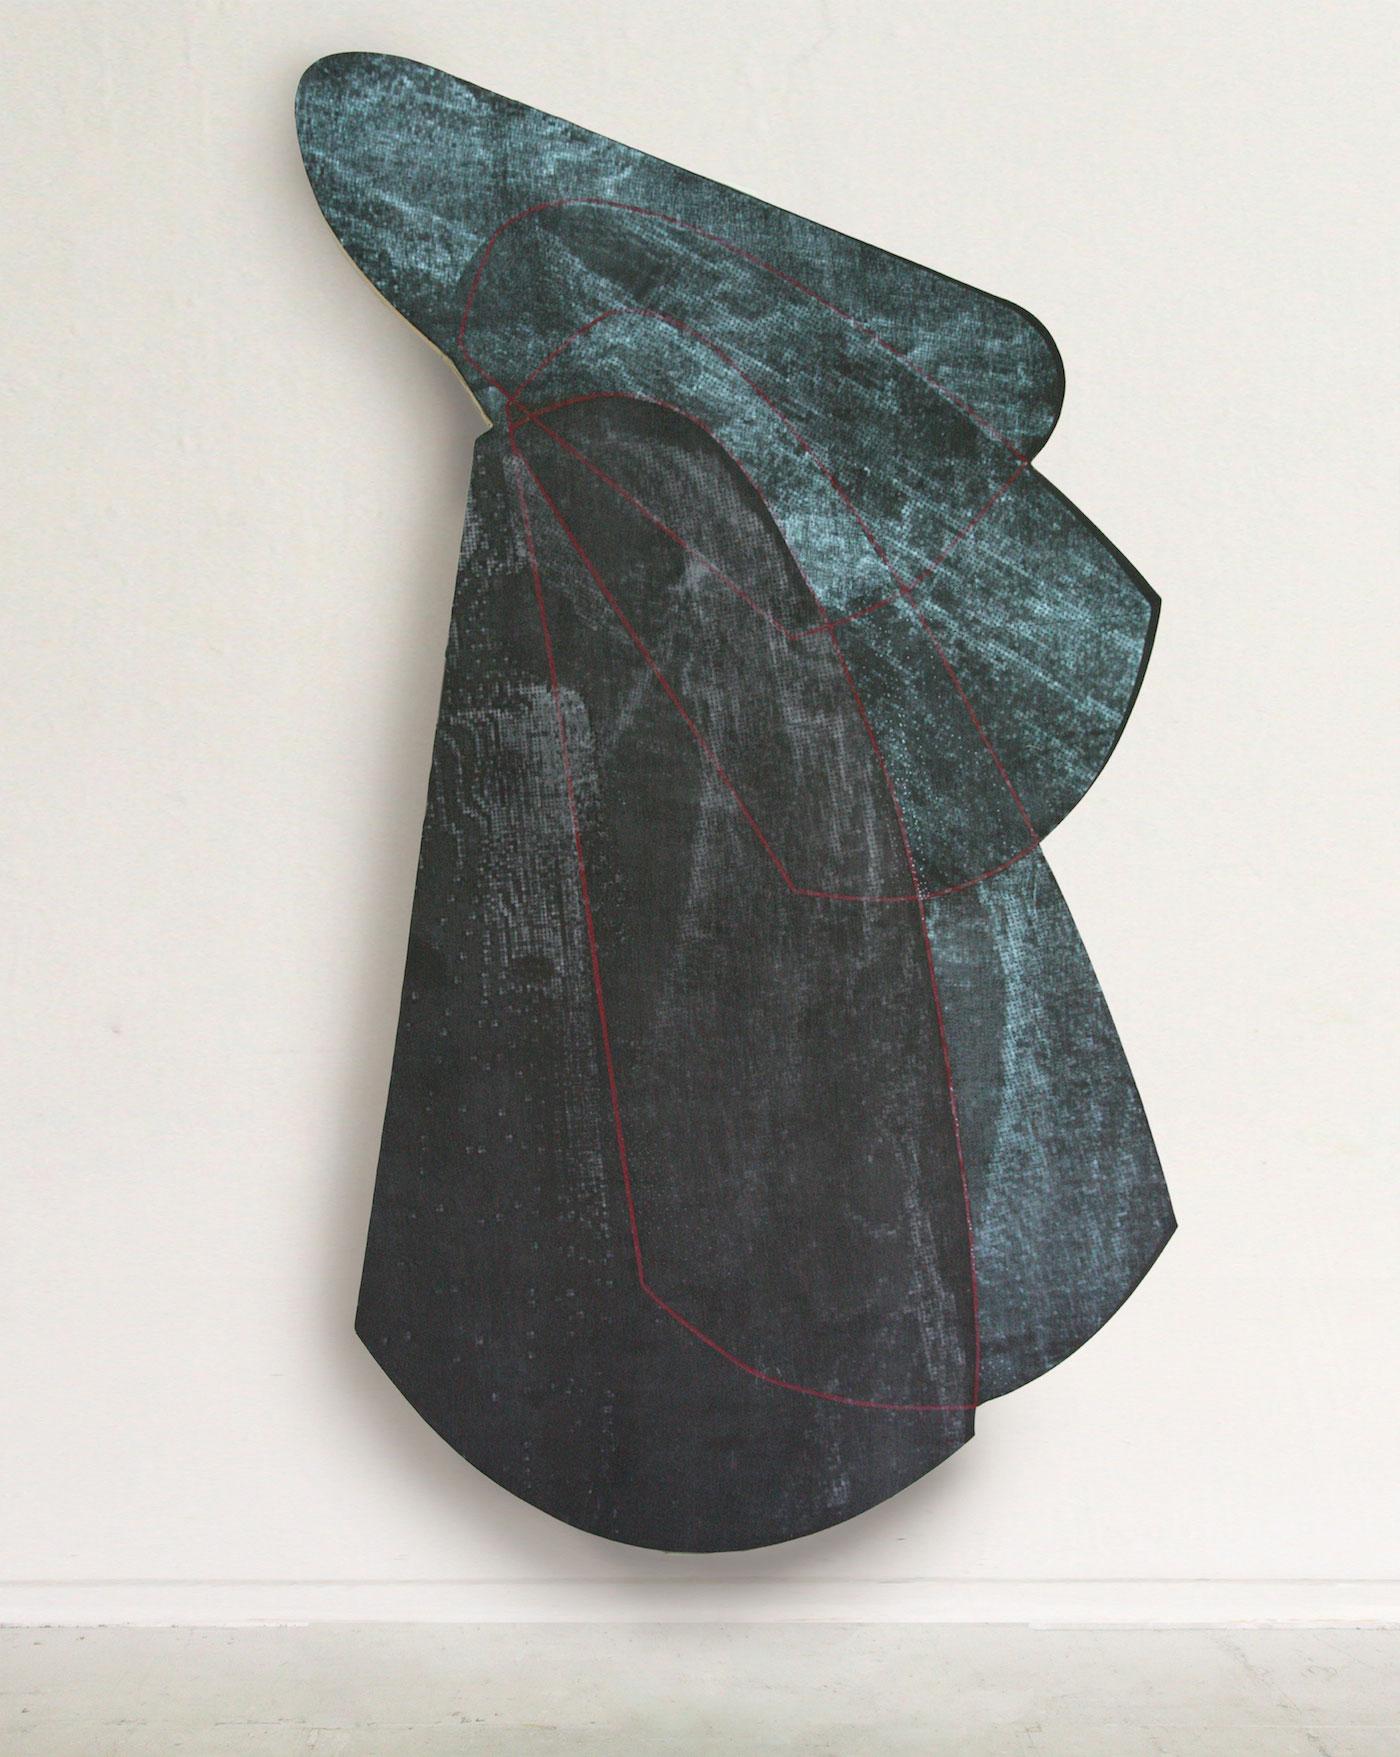 Genevieve Chua, Cicadas #2, Gusford Gallery, Booth C17. (Courtesy Gusford Gallery via Pulse Contemporary Art Fair)